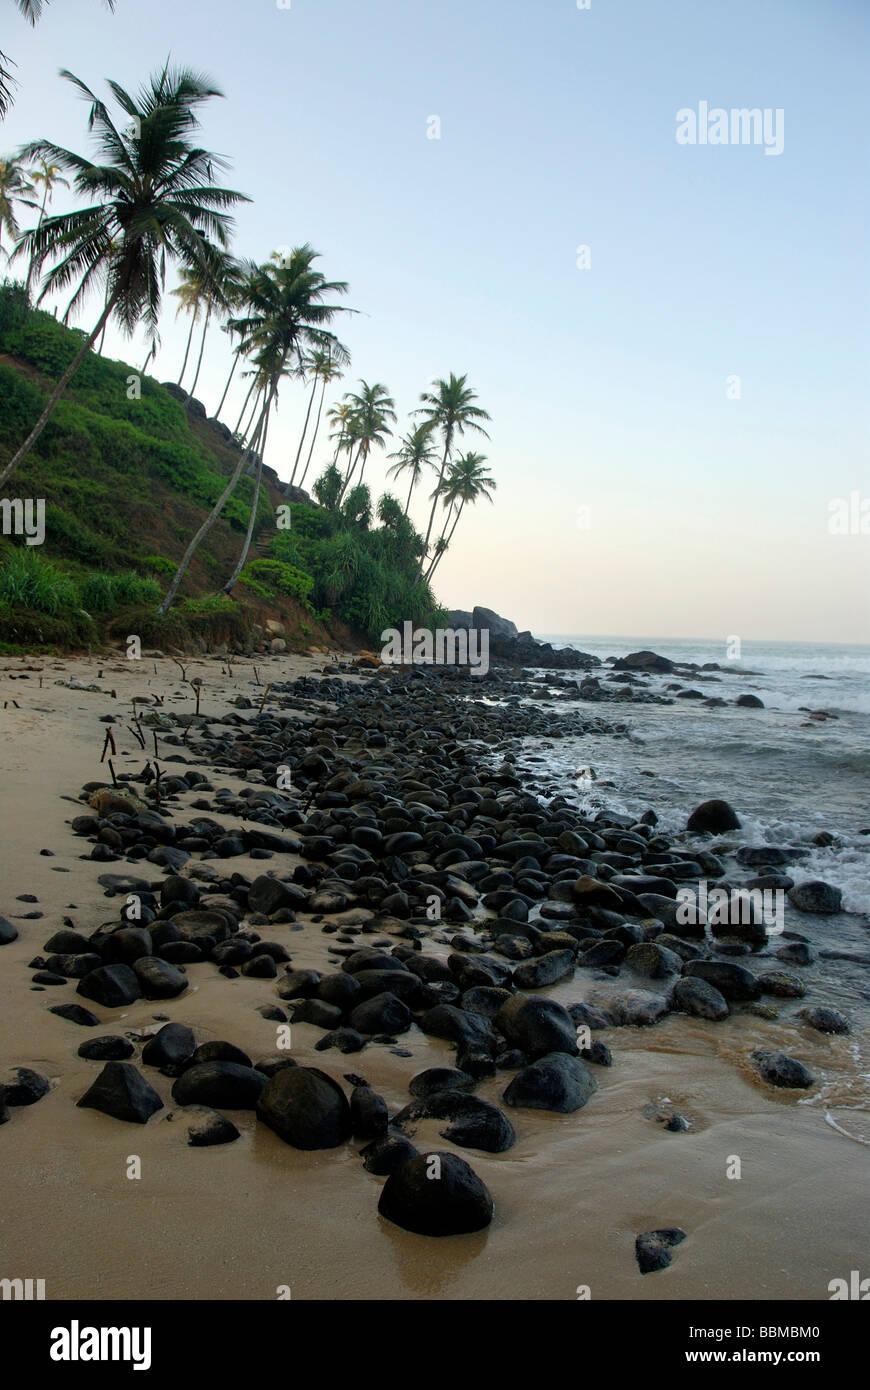 Stones on a beach, palm trees, Talalla near Dondra, Indian Ocean, Ceylon, Sri Lanka, South Asia - Stock Image